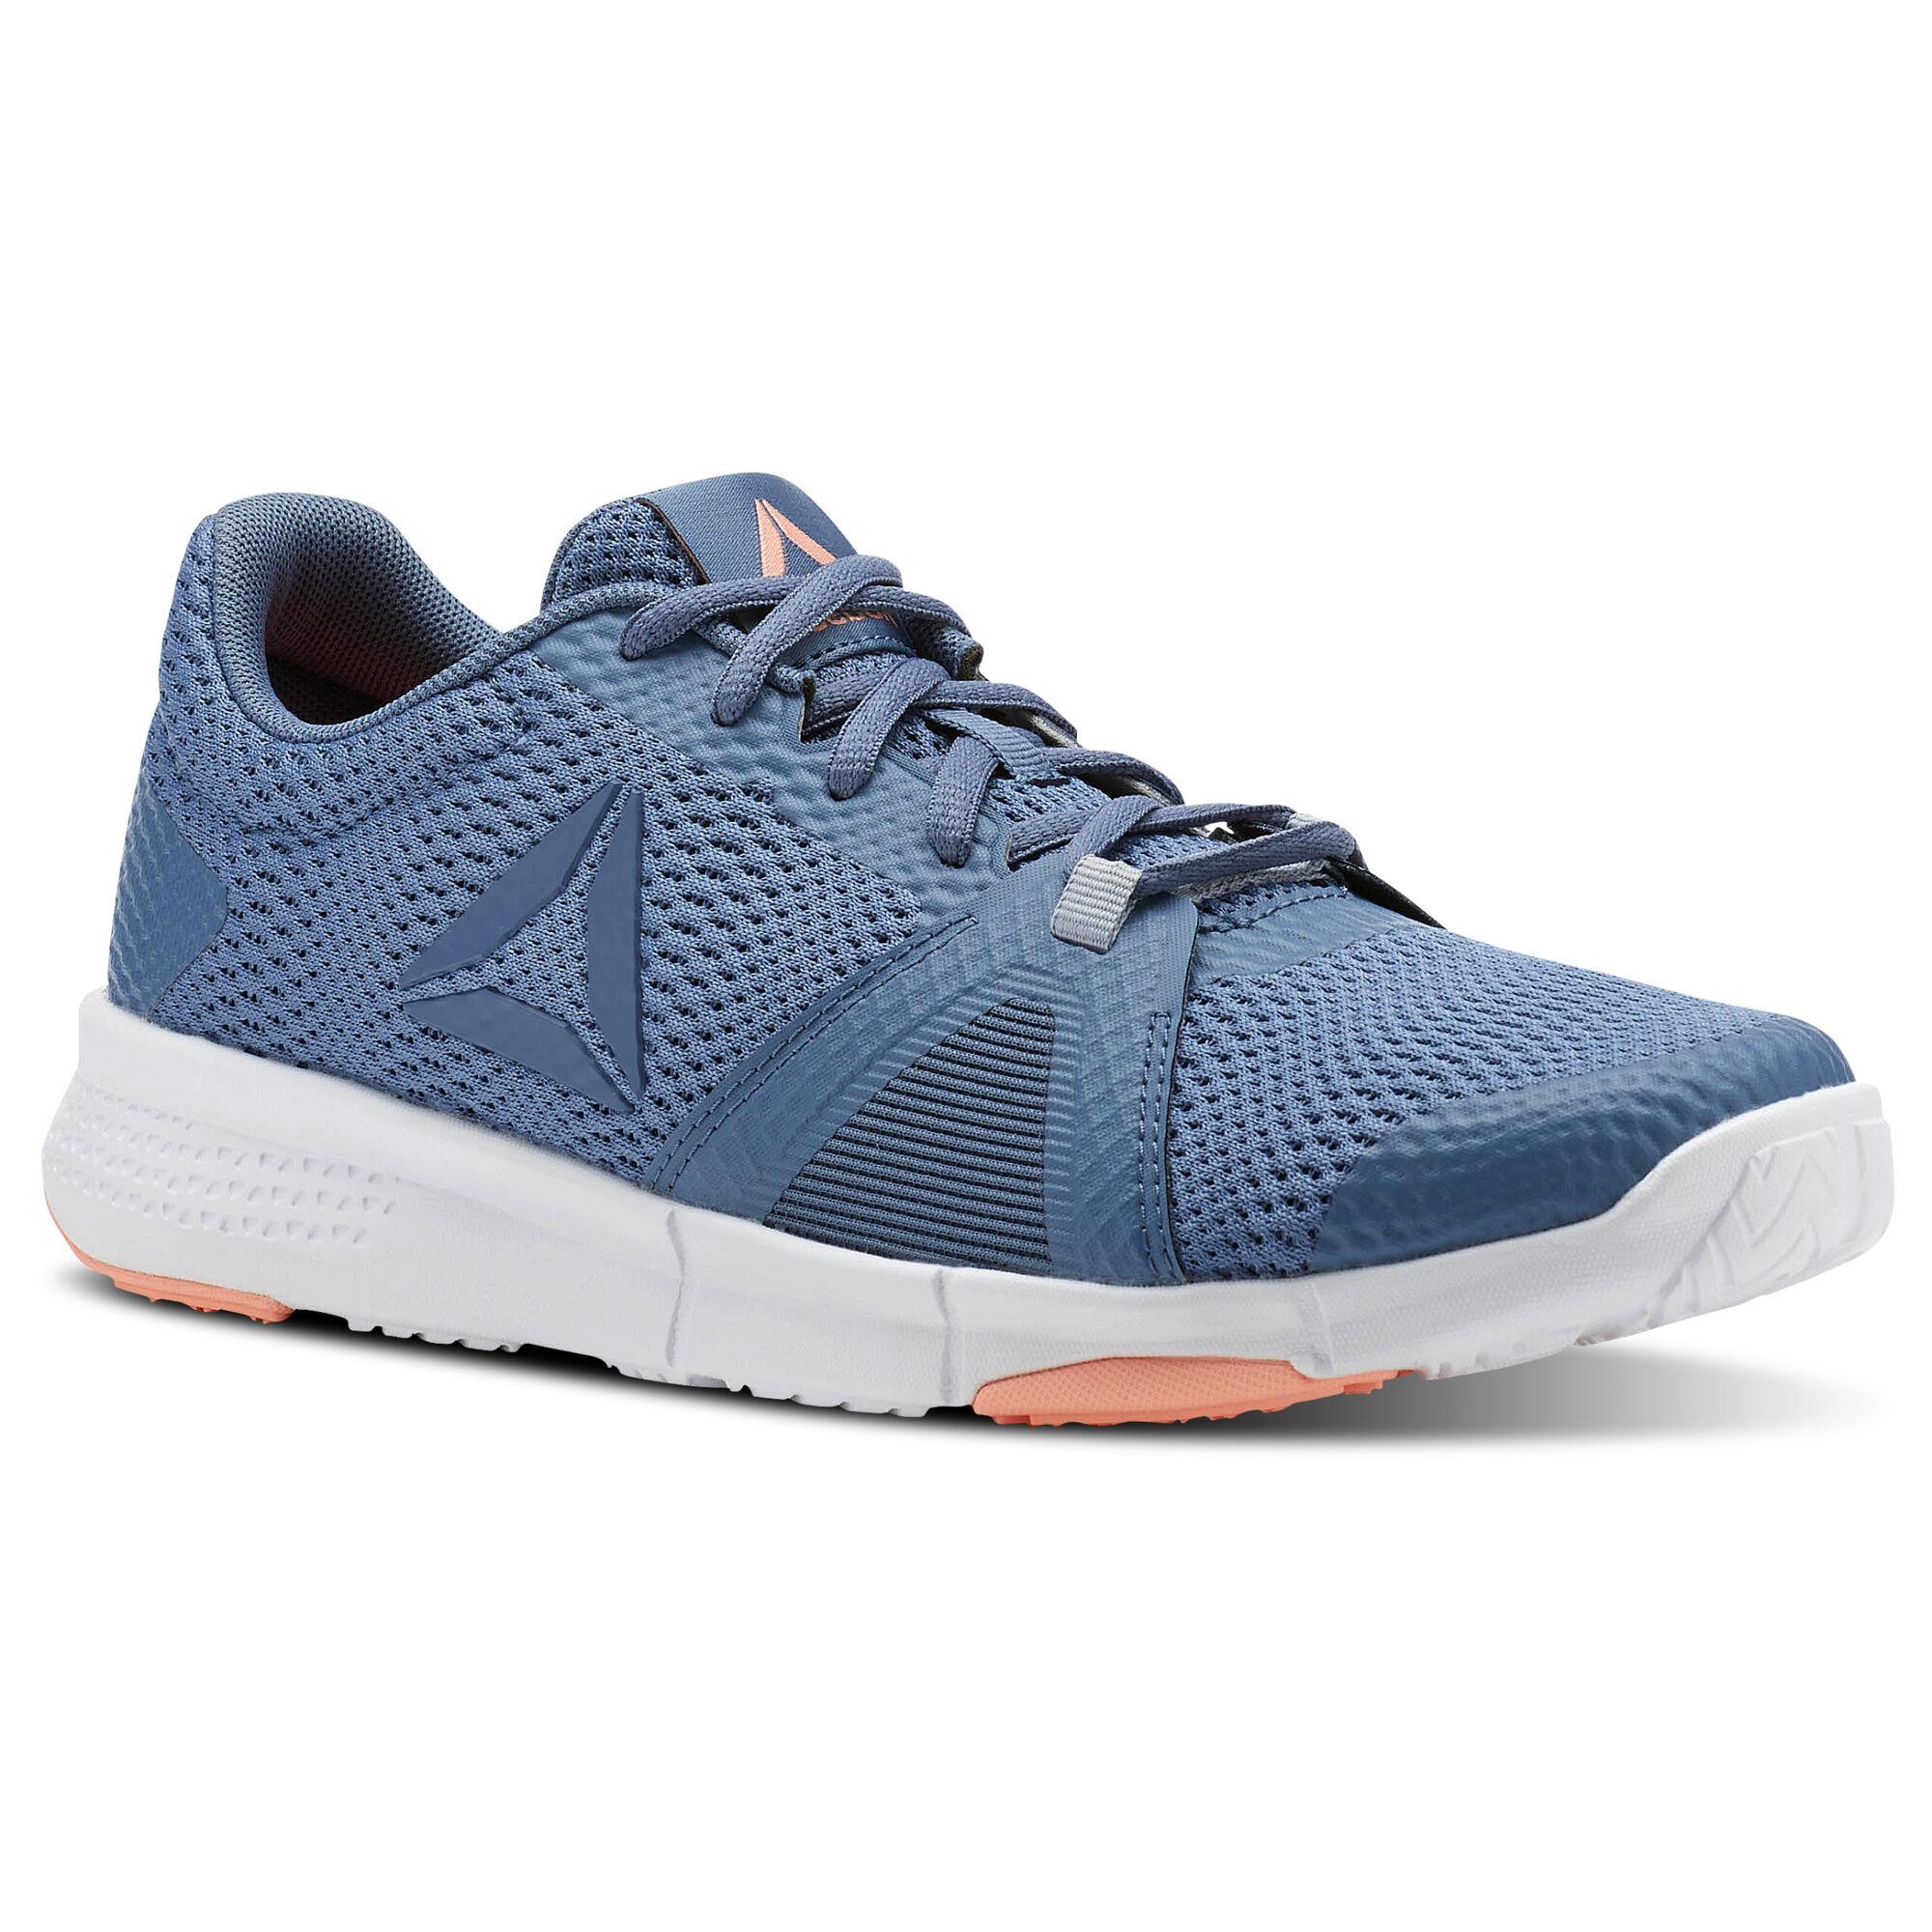 a0eda1a9784e01 Reebok Womens Sawcut GTX 6.0 Fitness Shoes CN5020 Top Christmas ...